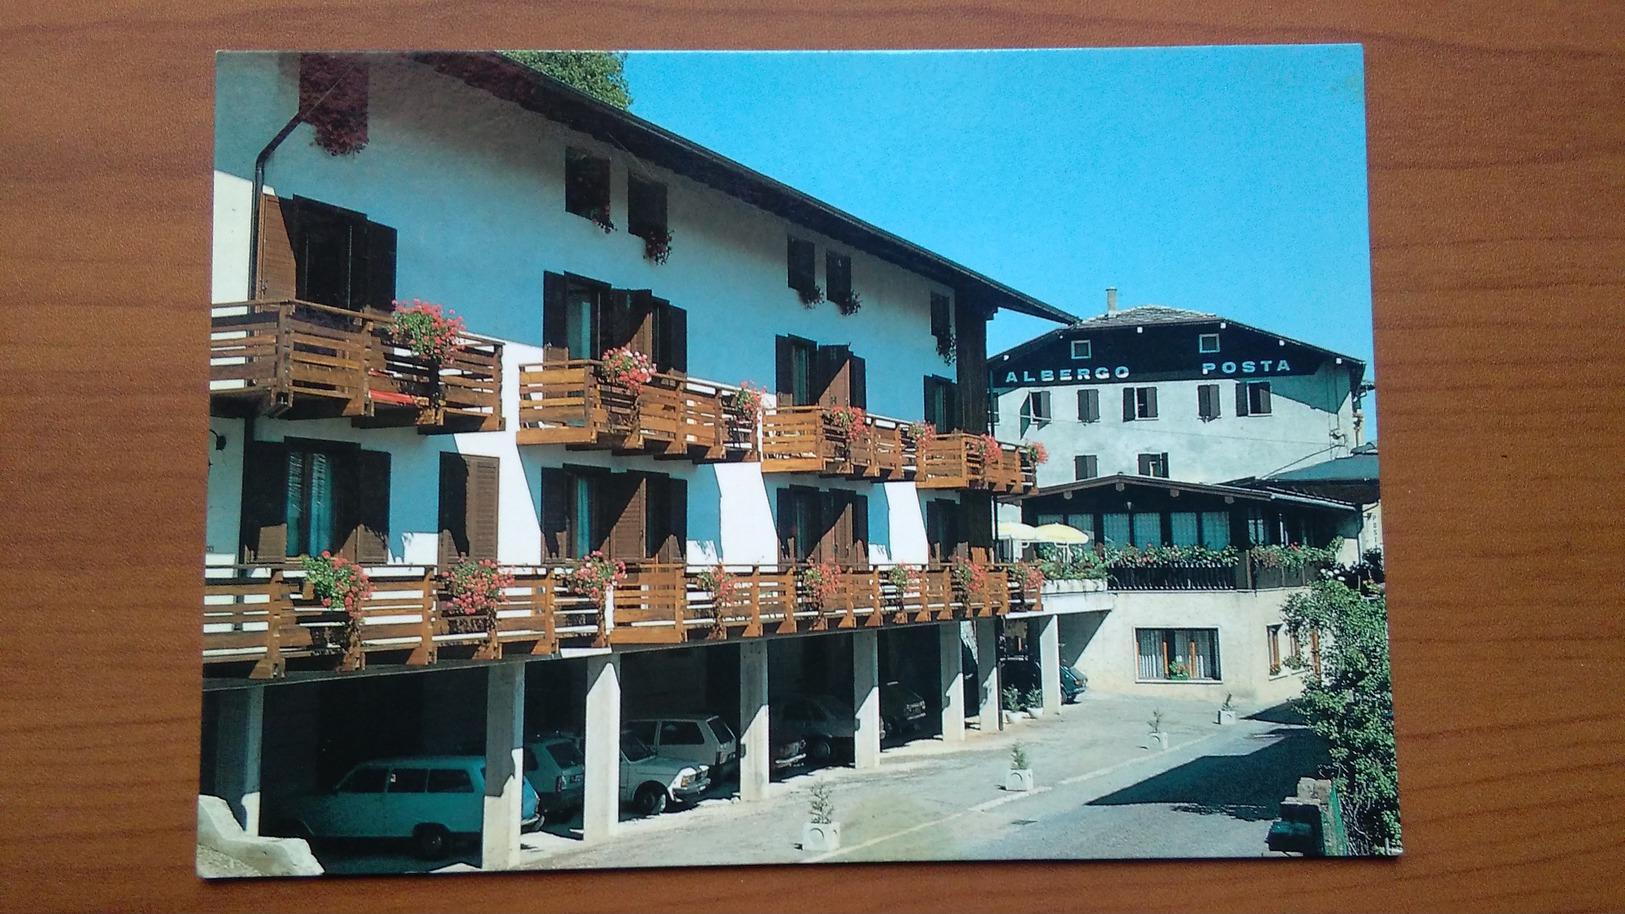 Montagnaga Di Pine' - Albergo Ristorante Posta - Trento